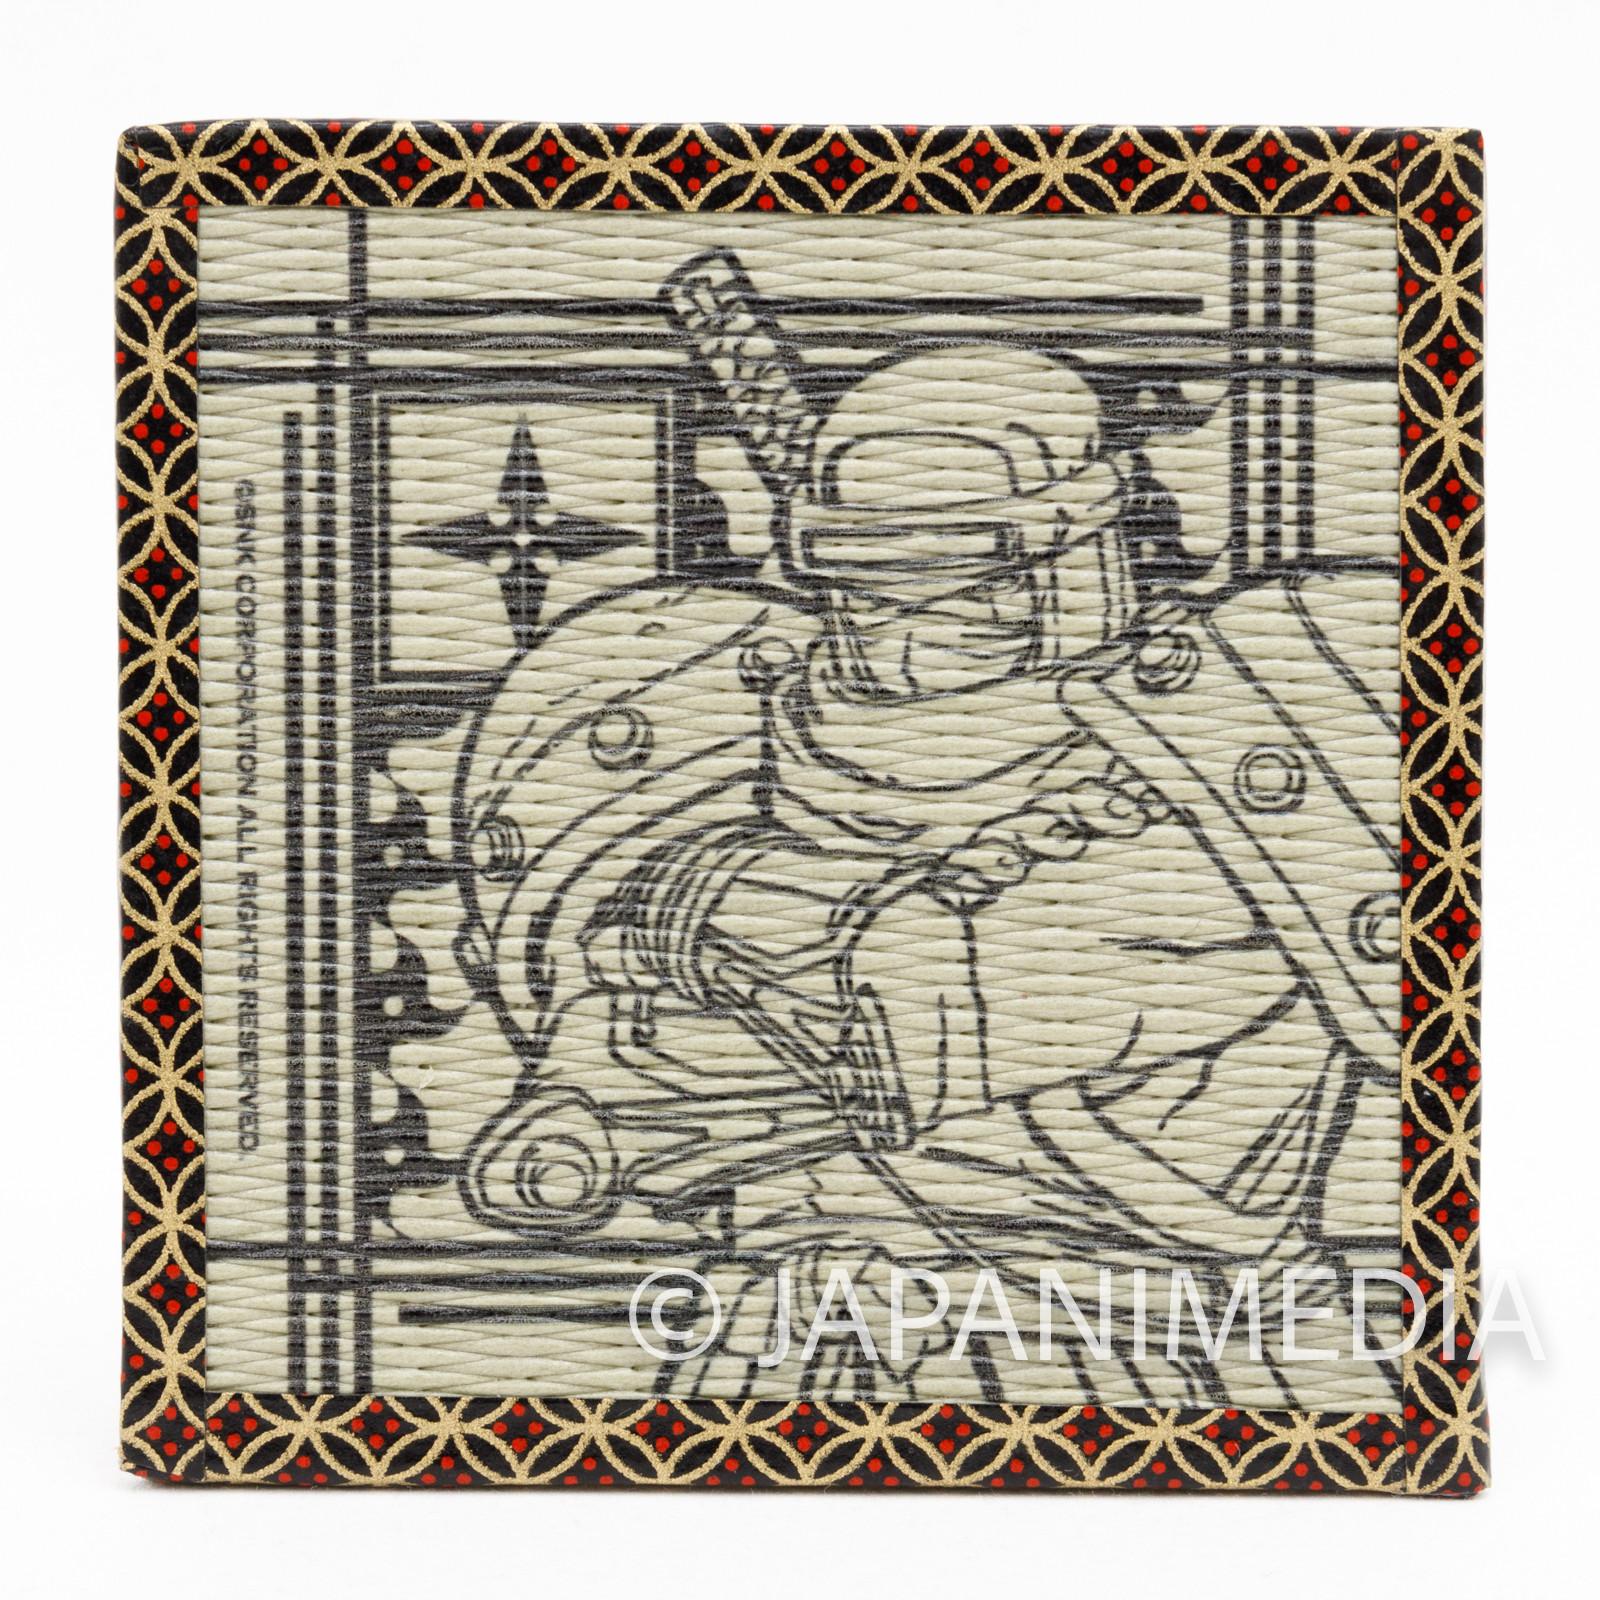 Samurai Shodown Hanzo Hattori Tatami Coaster SNK JAPAN NEOGEO SPIRITS